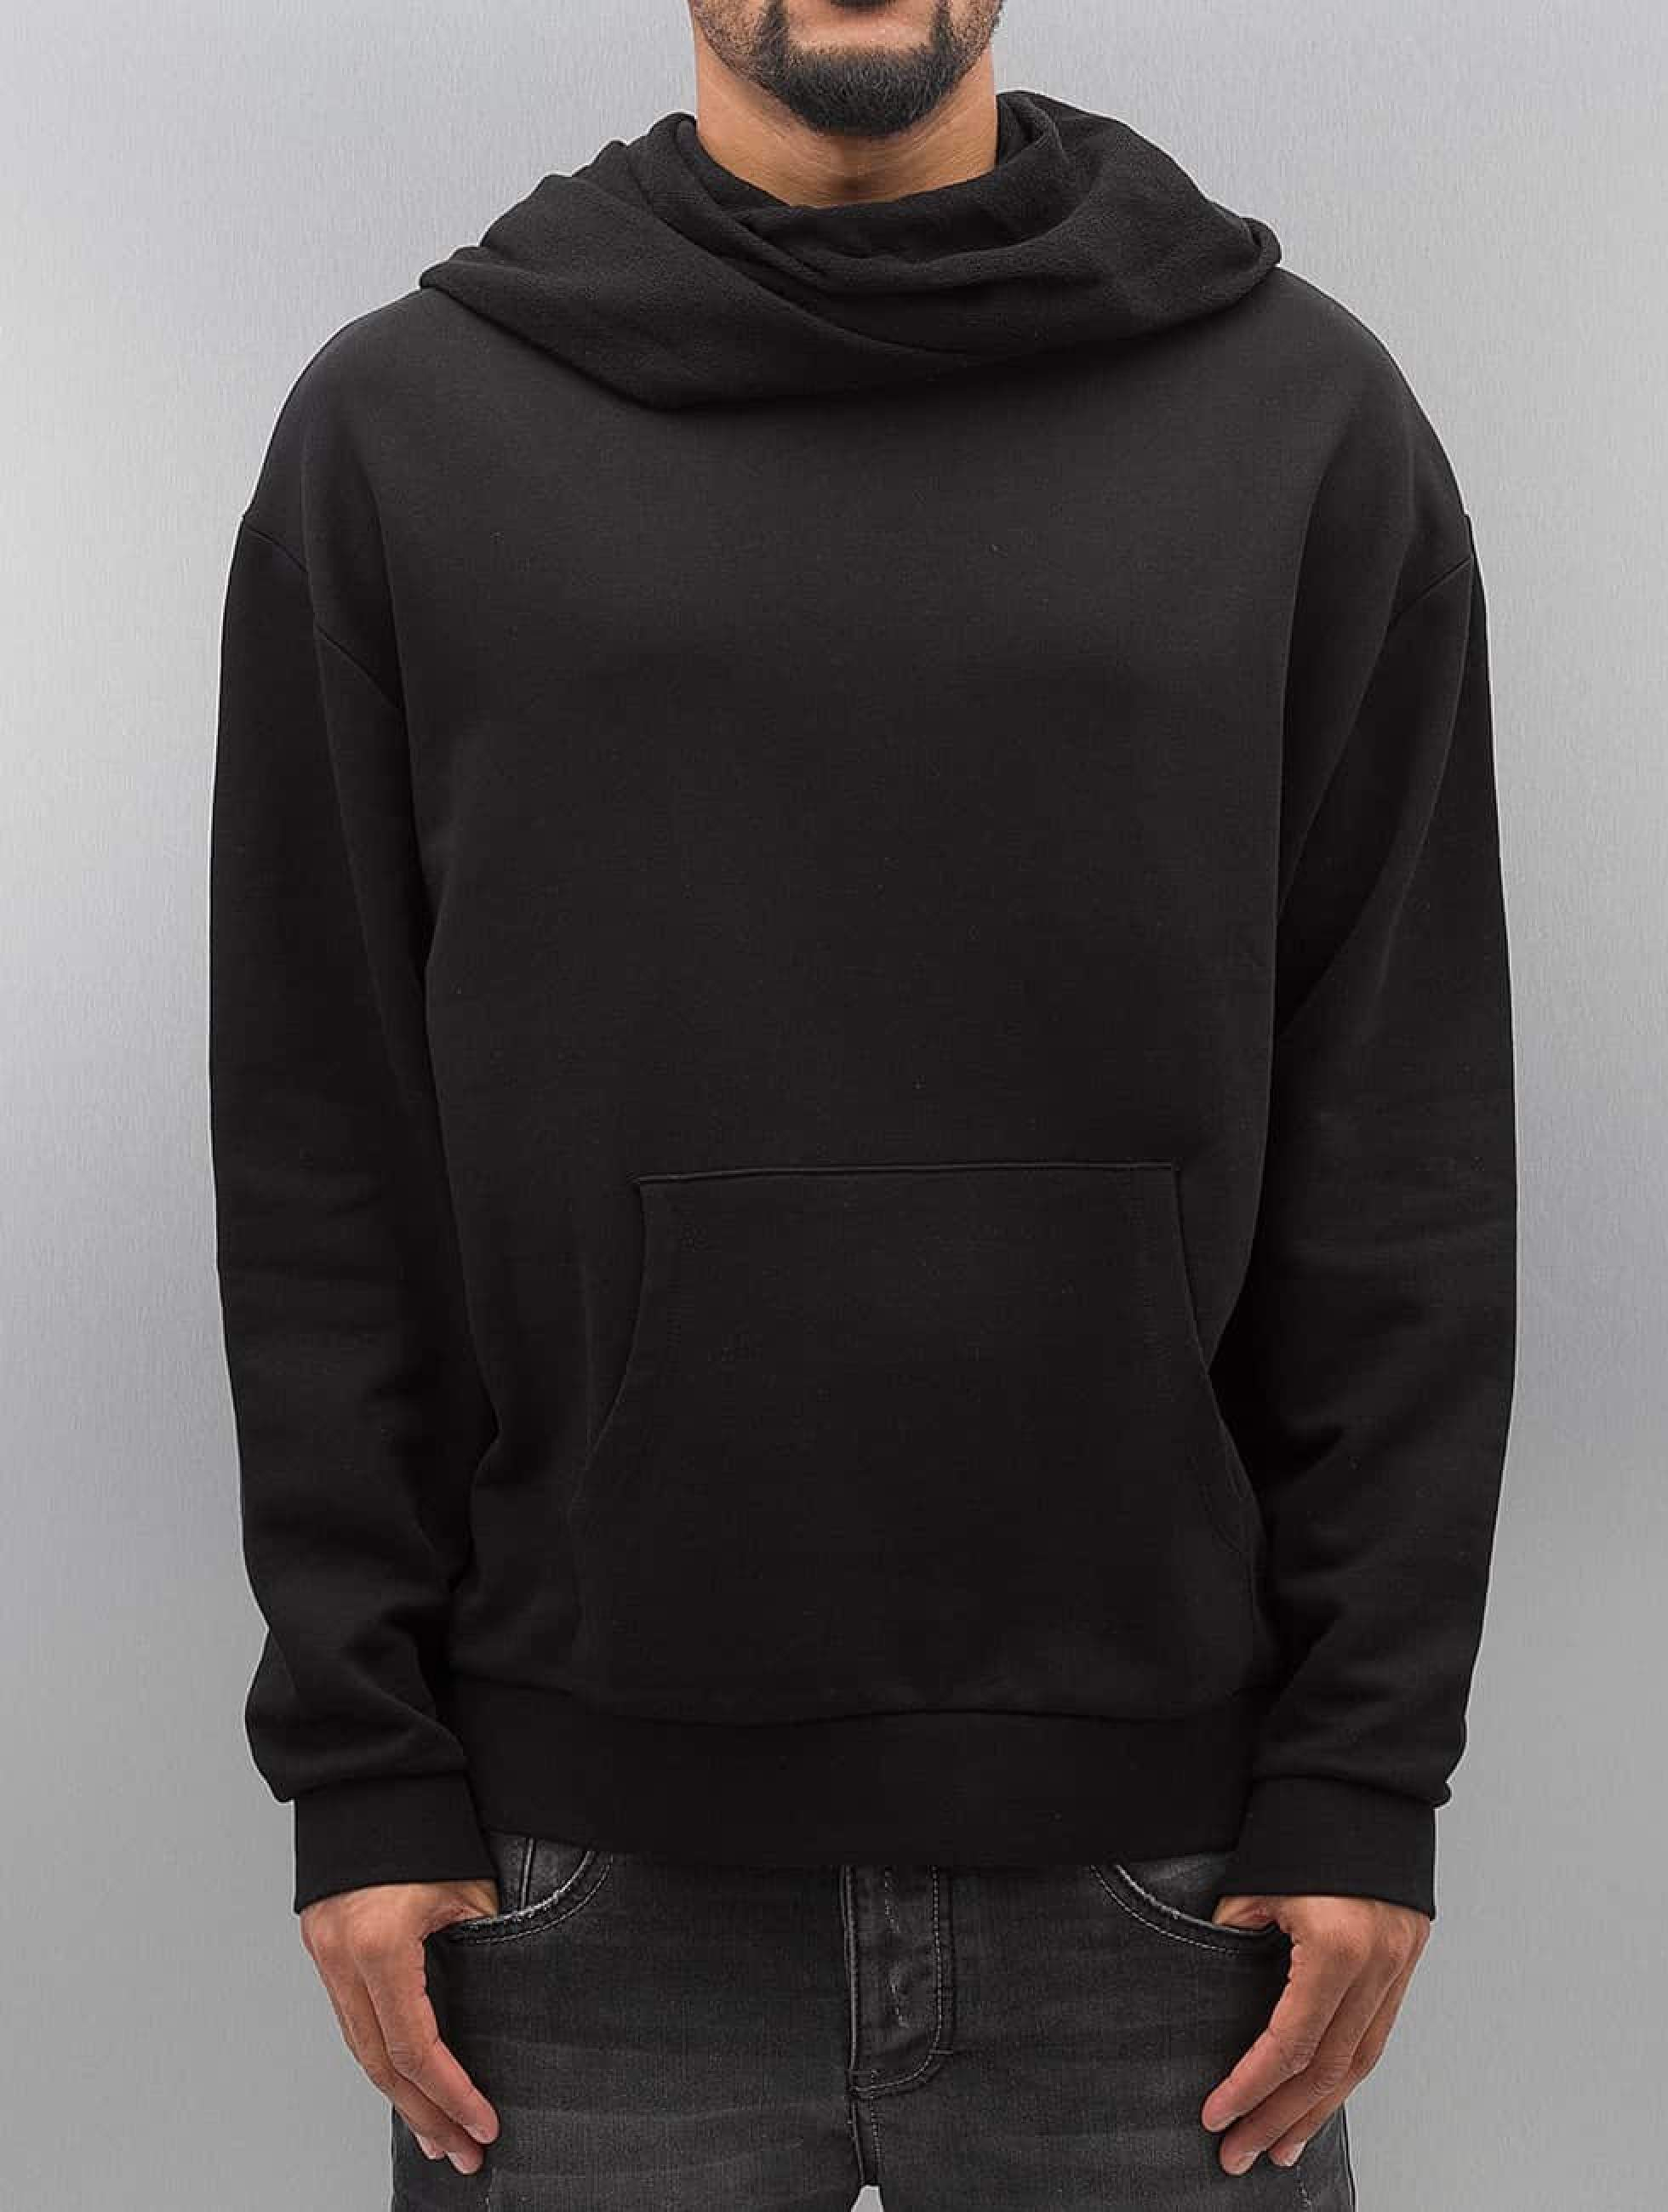 Bangastic / Hoodie Monabiker Oversize in black L